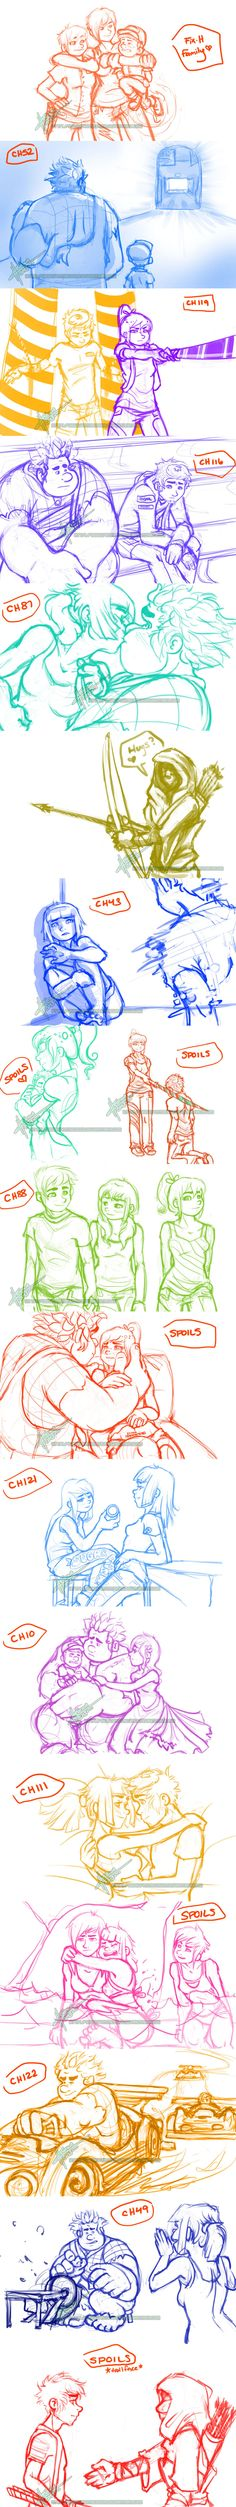 Wrecking Limits Sketchdump 3 by Vyntresser